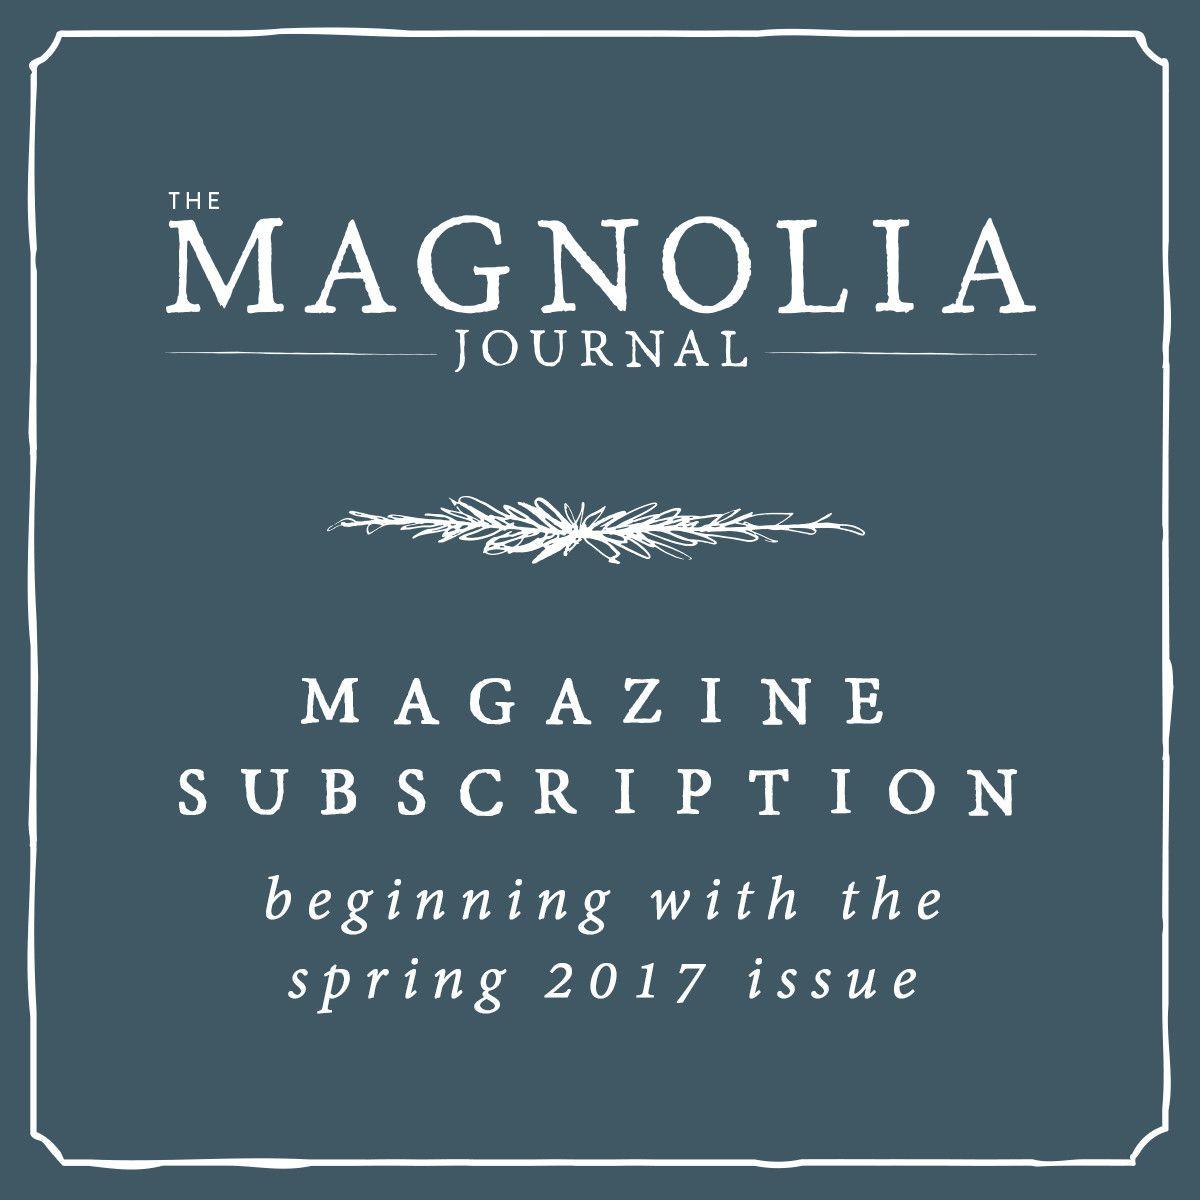 the magnolia journal subscription magnolia journal on wall street journal subscription id=86488